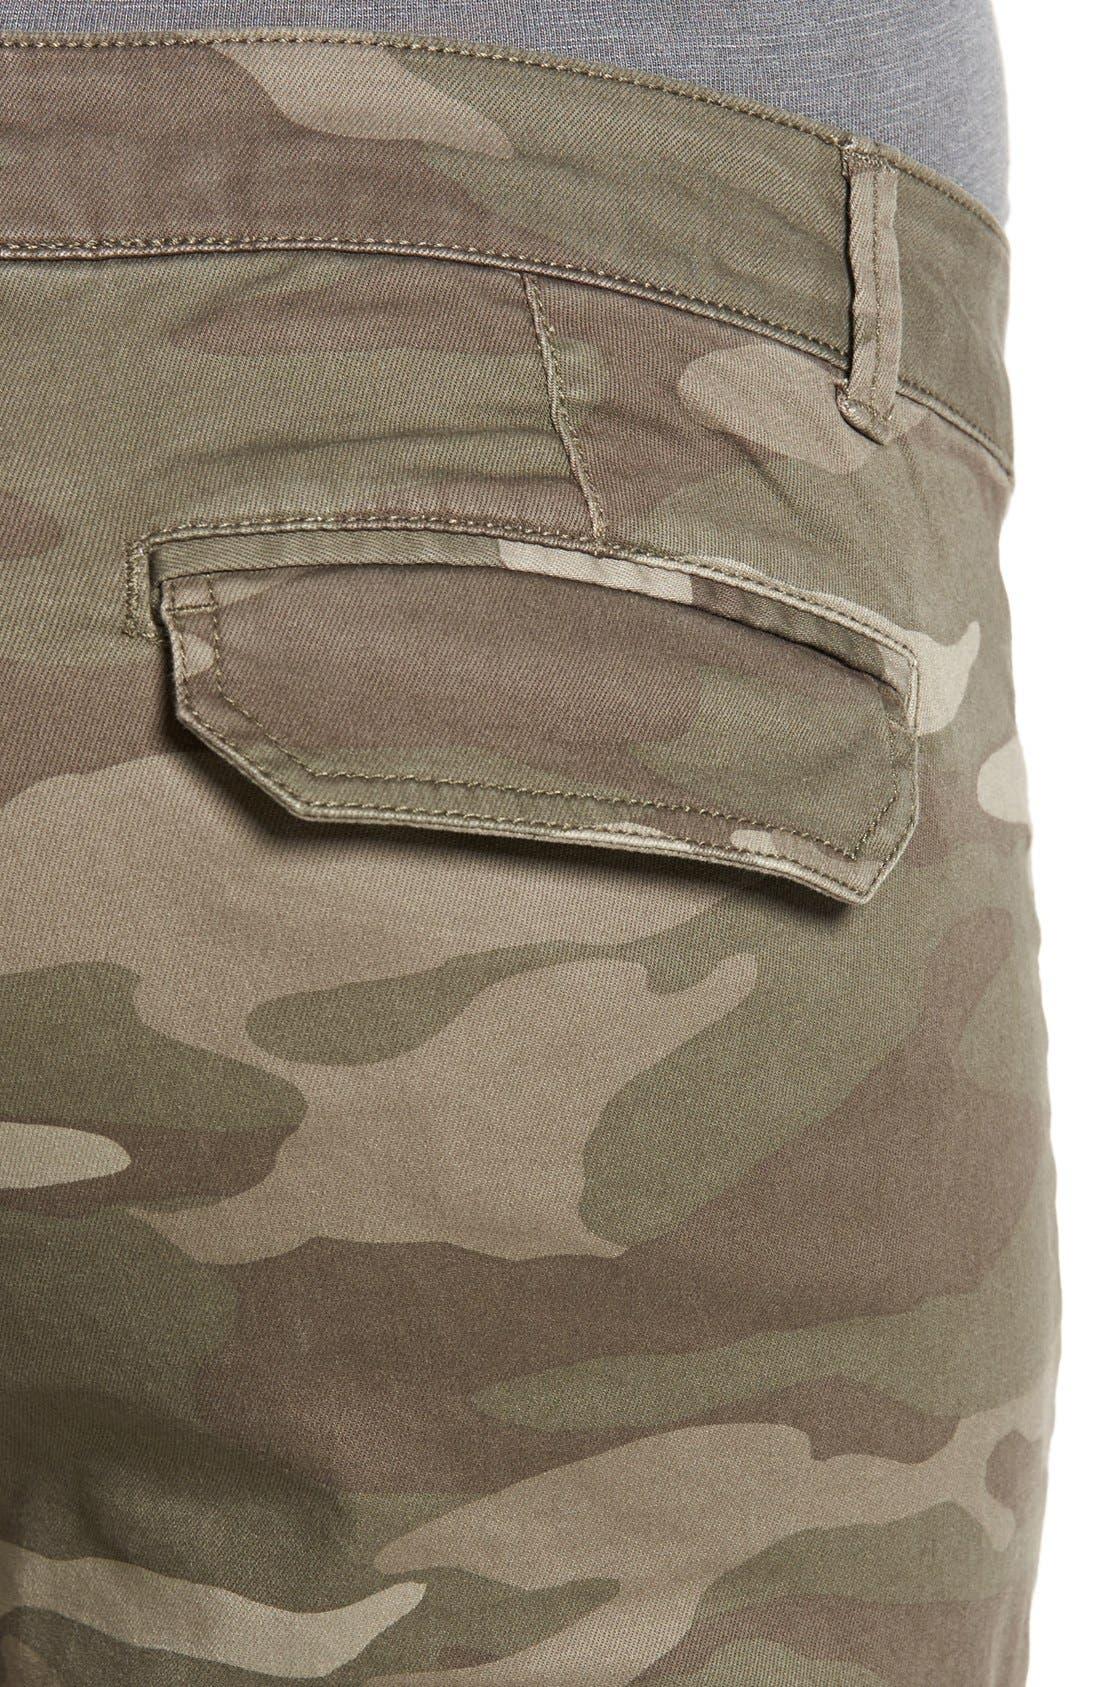 Skinny Cargo Pants,                             Alternate thumbnail 3, color,                             Mushroom